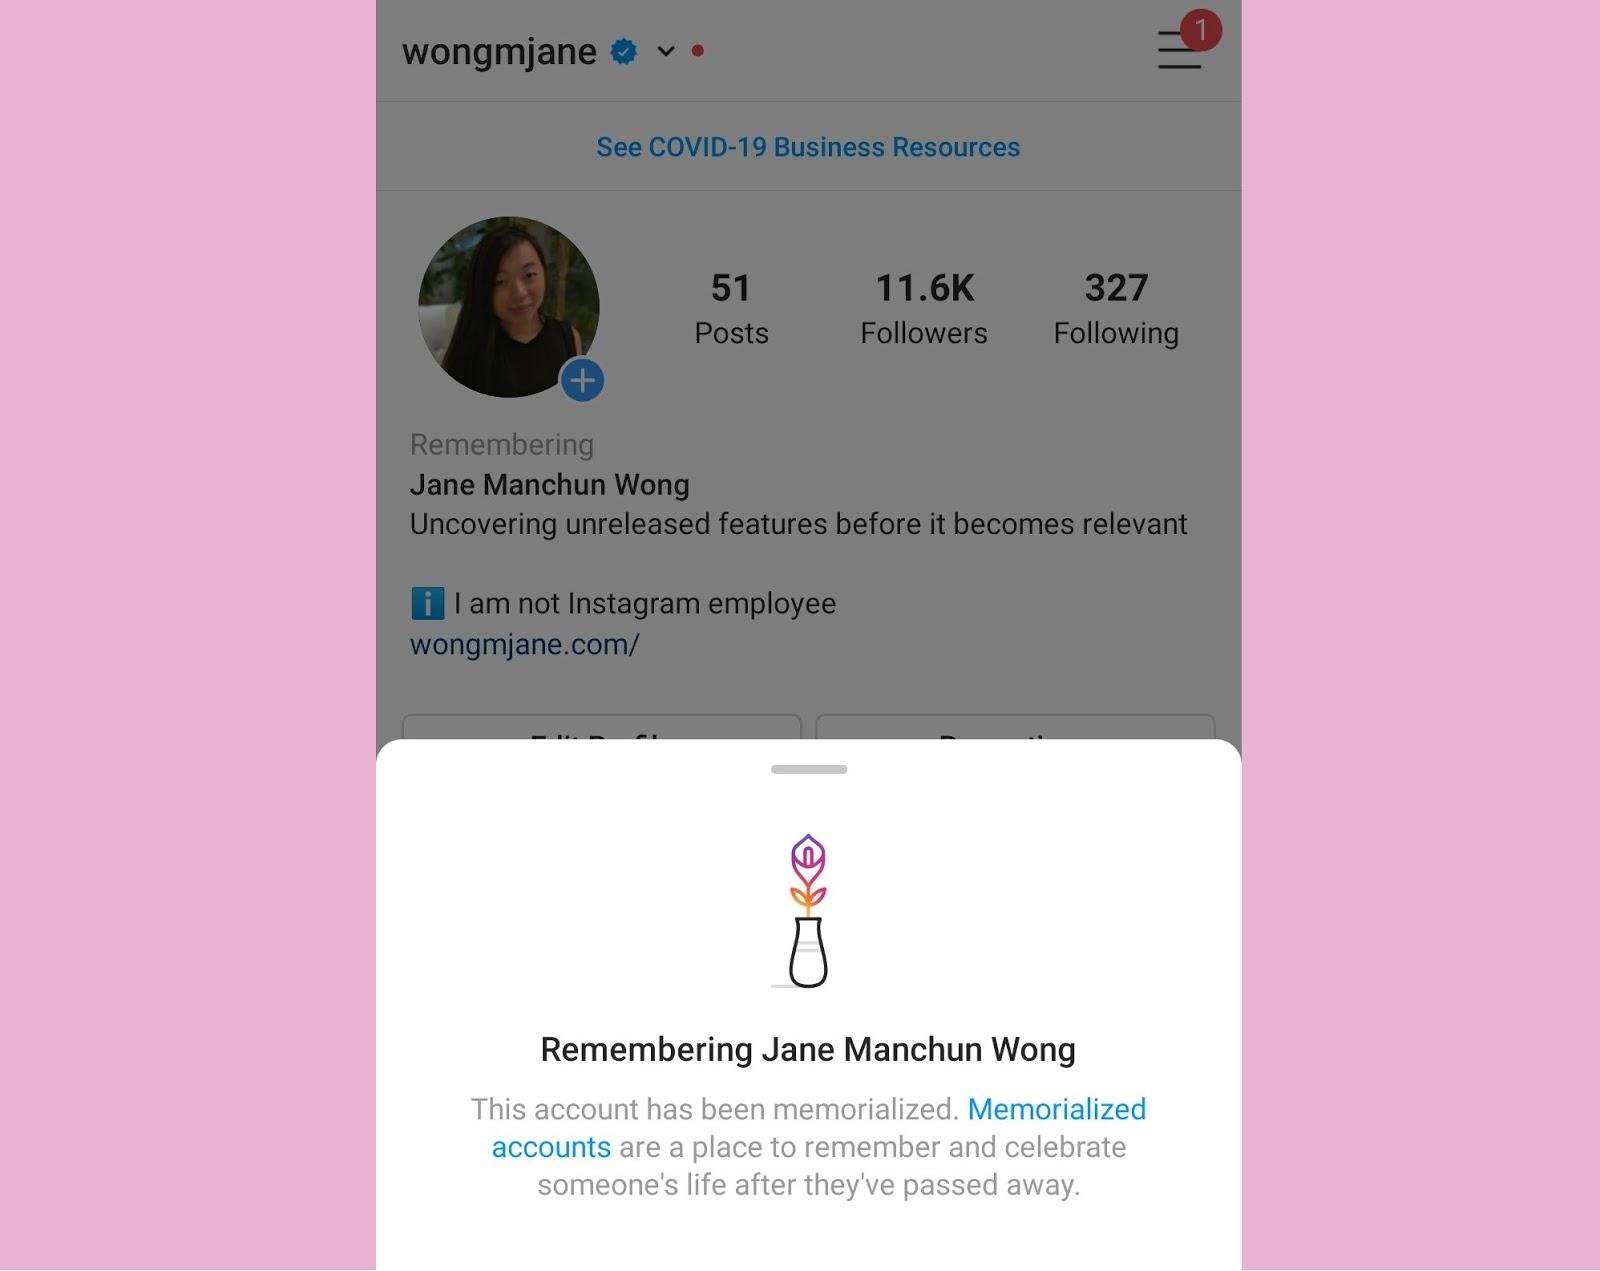 Instagram To Soon Release An In-Memoriam Feature For Deceased People